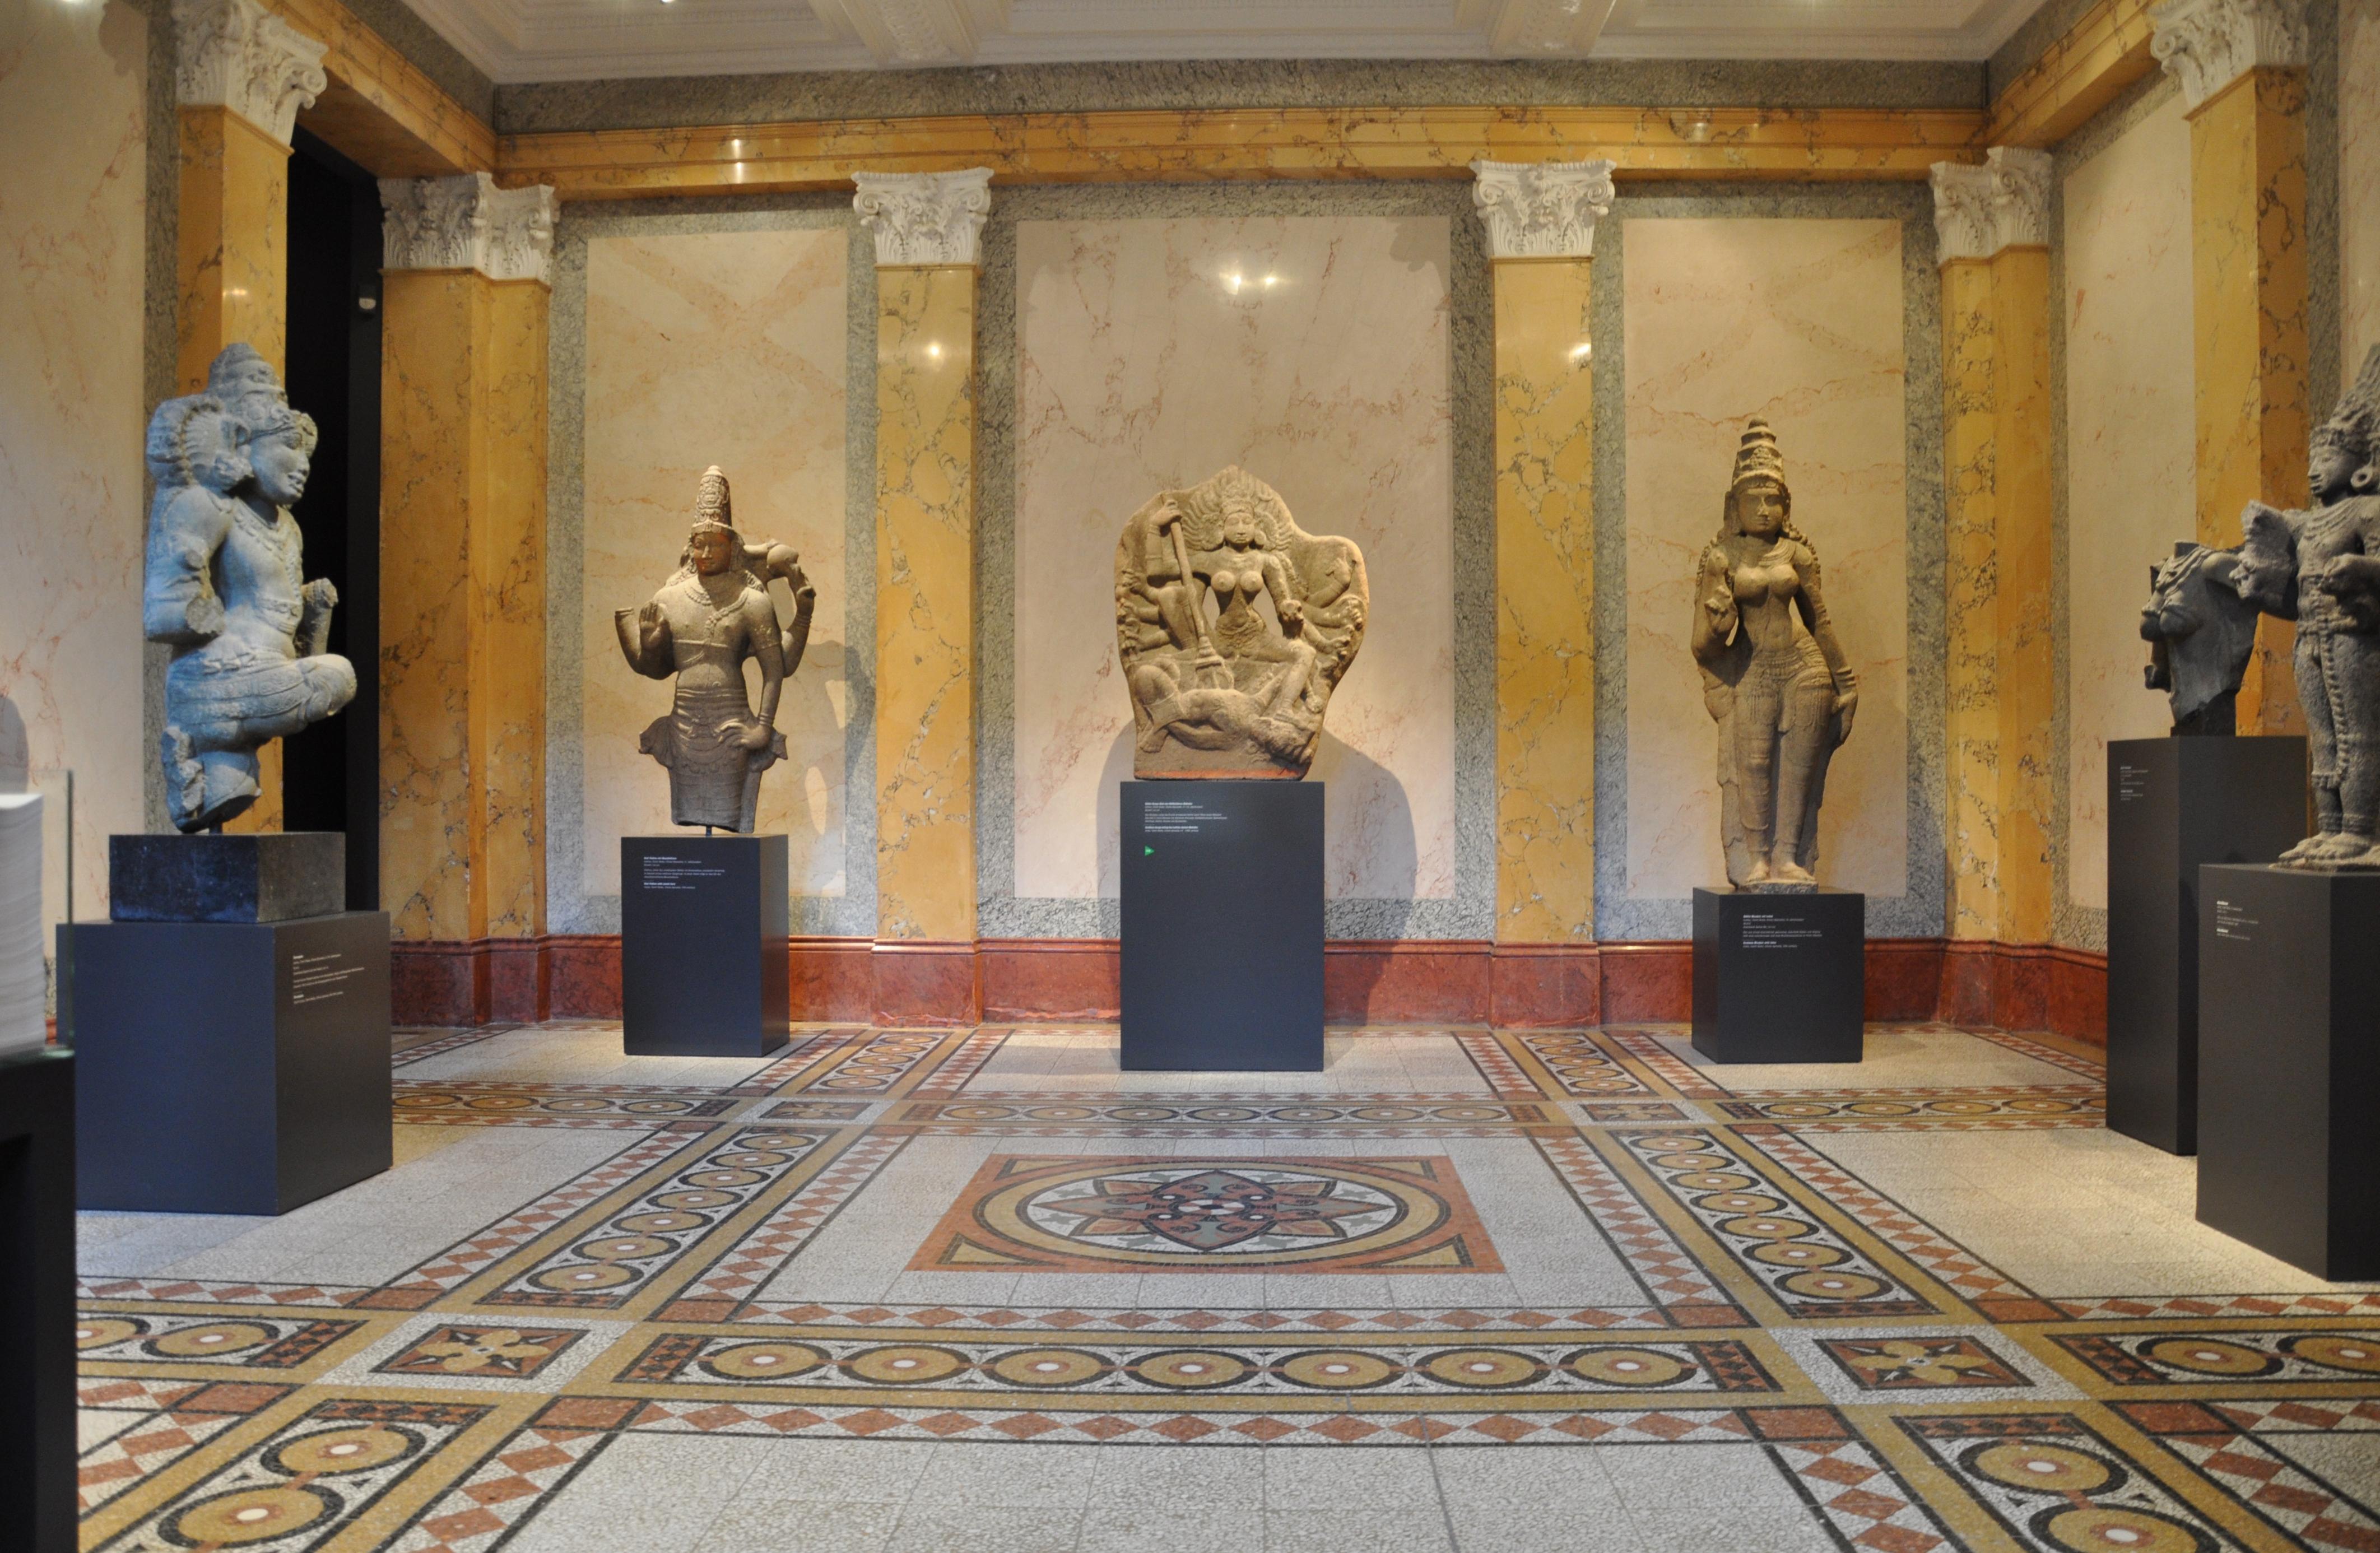 File:Museum Rietberg Villa Wesendonck Indien.jpg - Wikimedia Commons